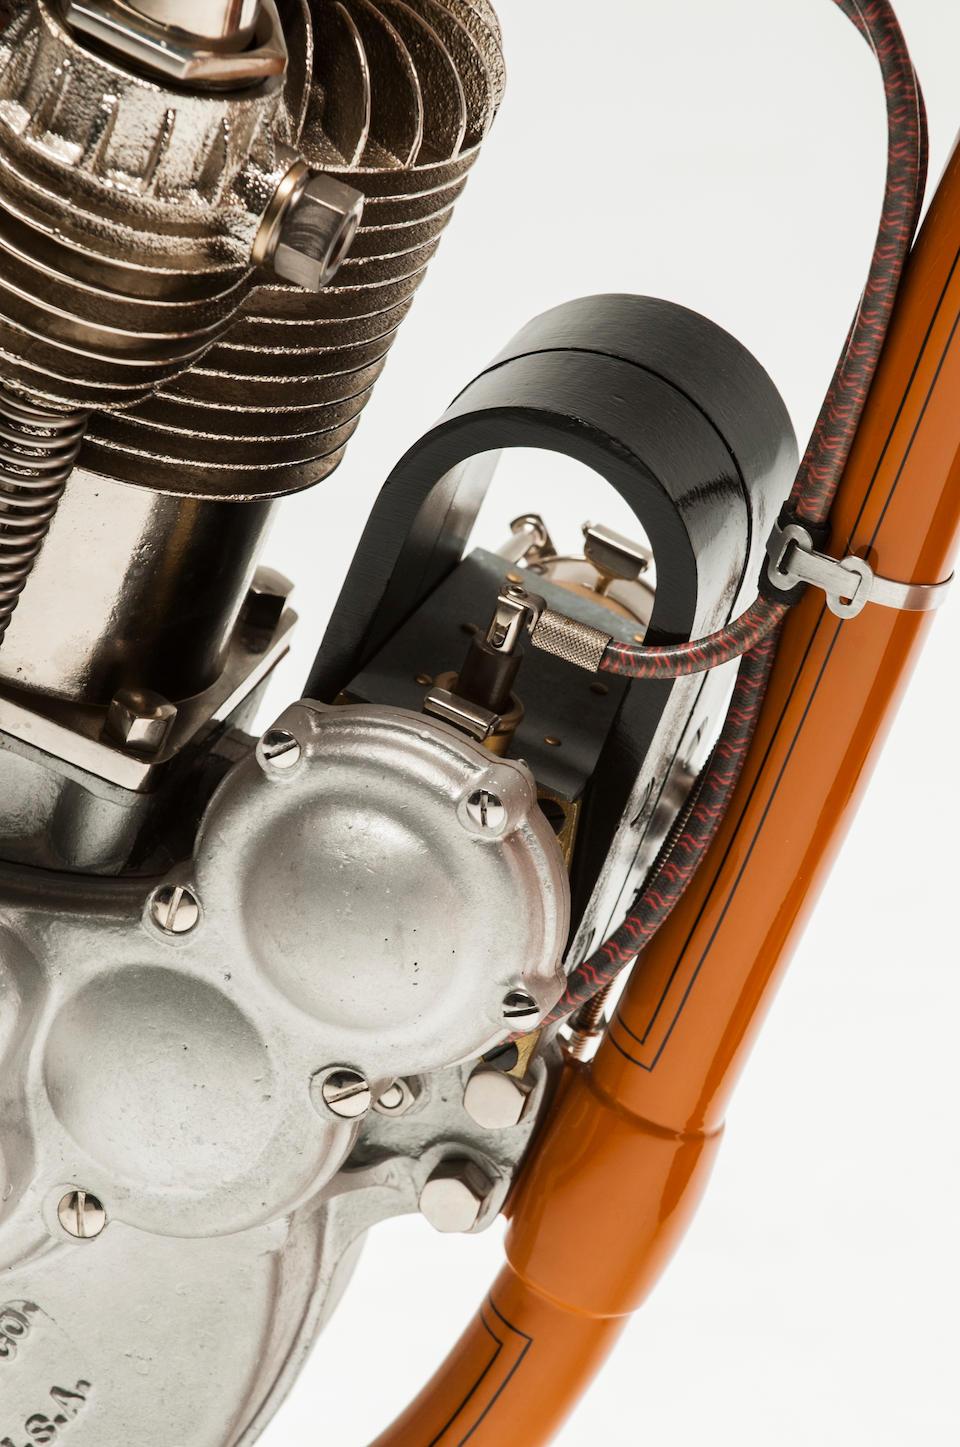 1912 Flying Merkel Belt Drive V-Twin